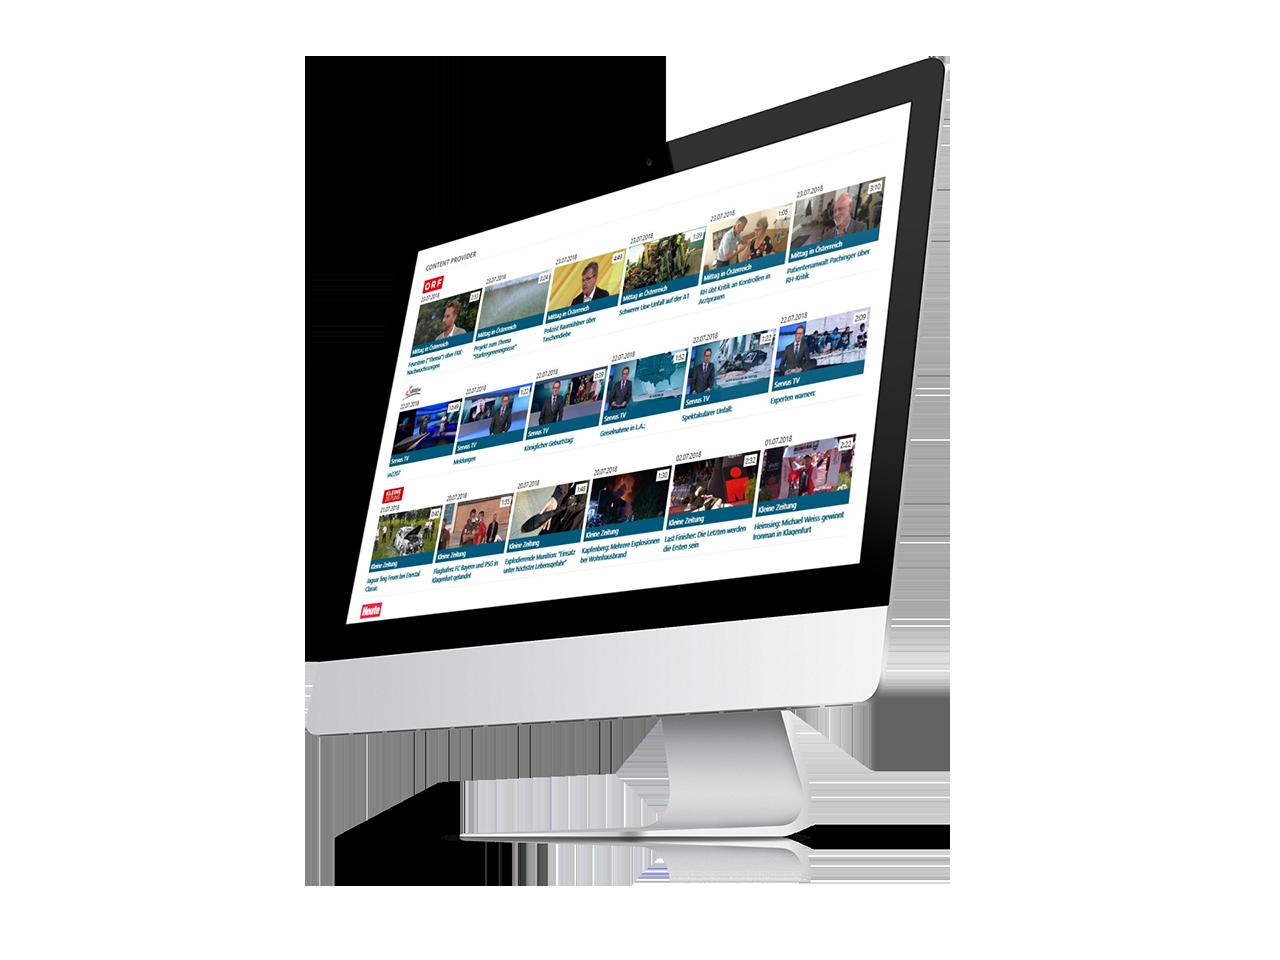 Austria Videoplattform (AVP)